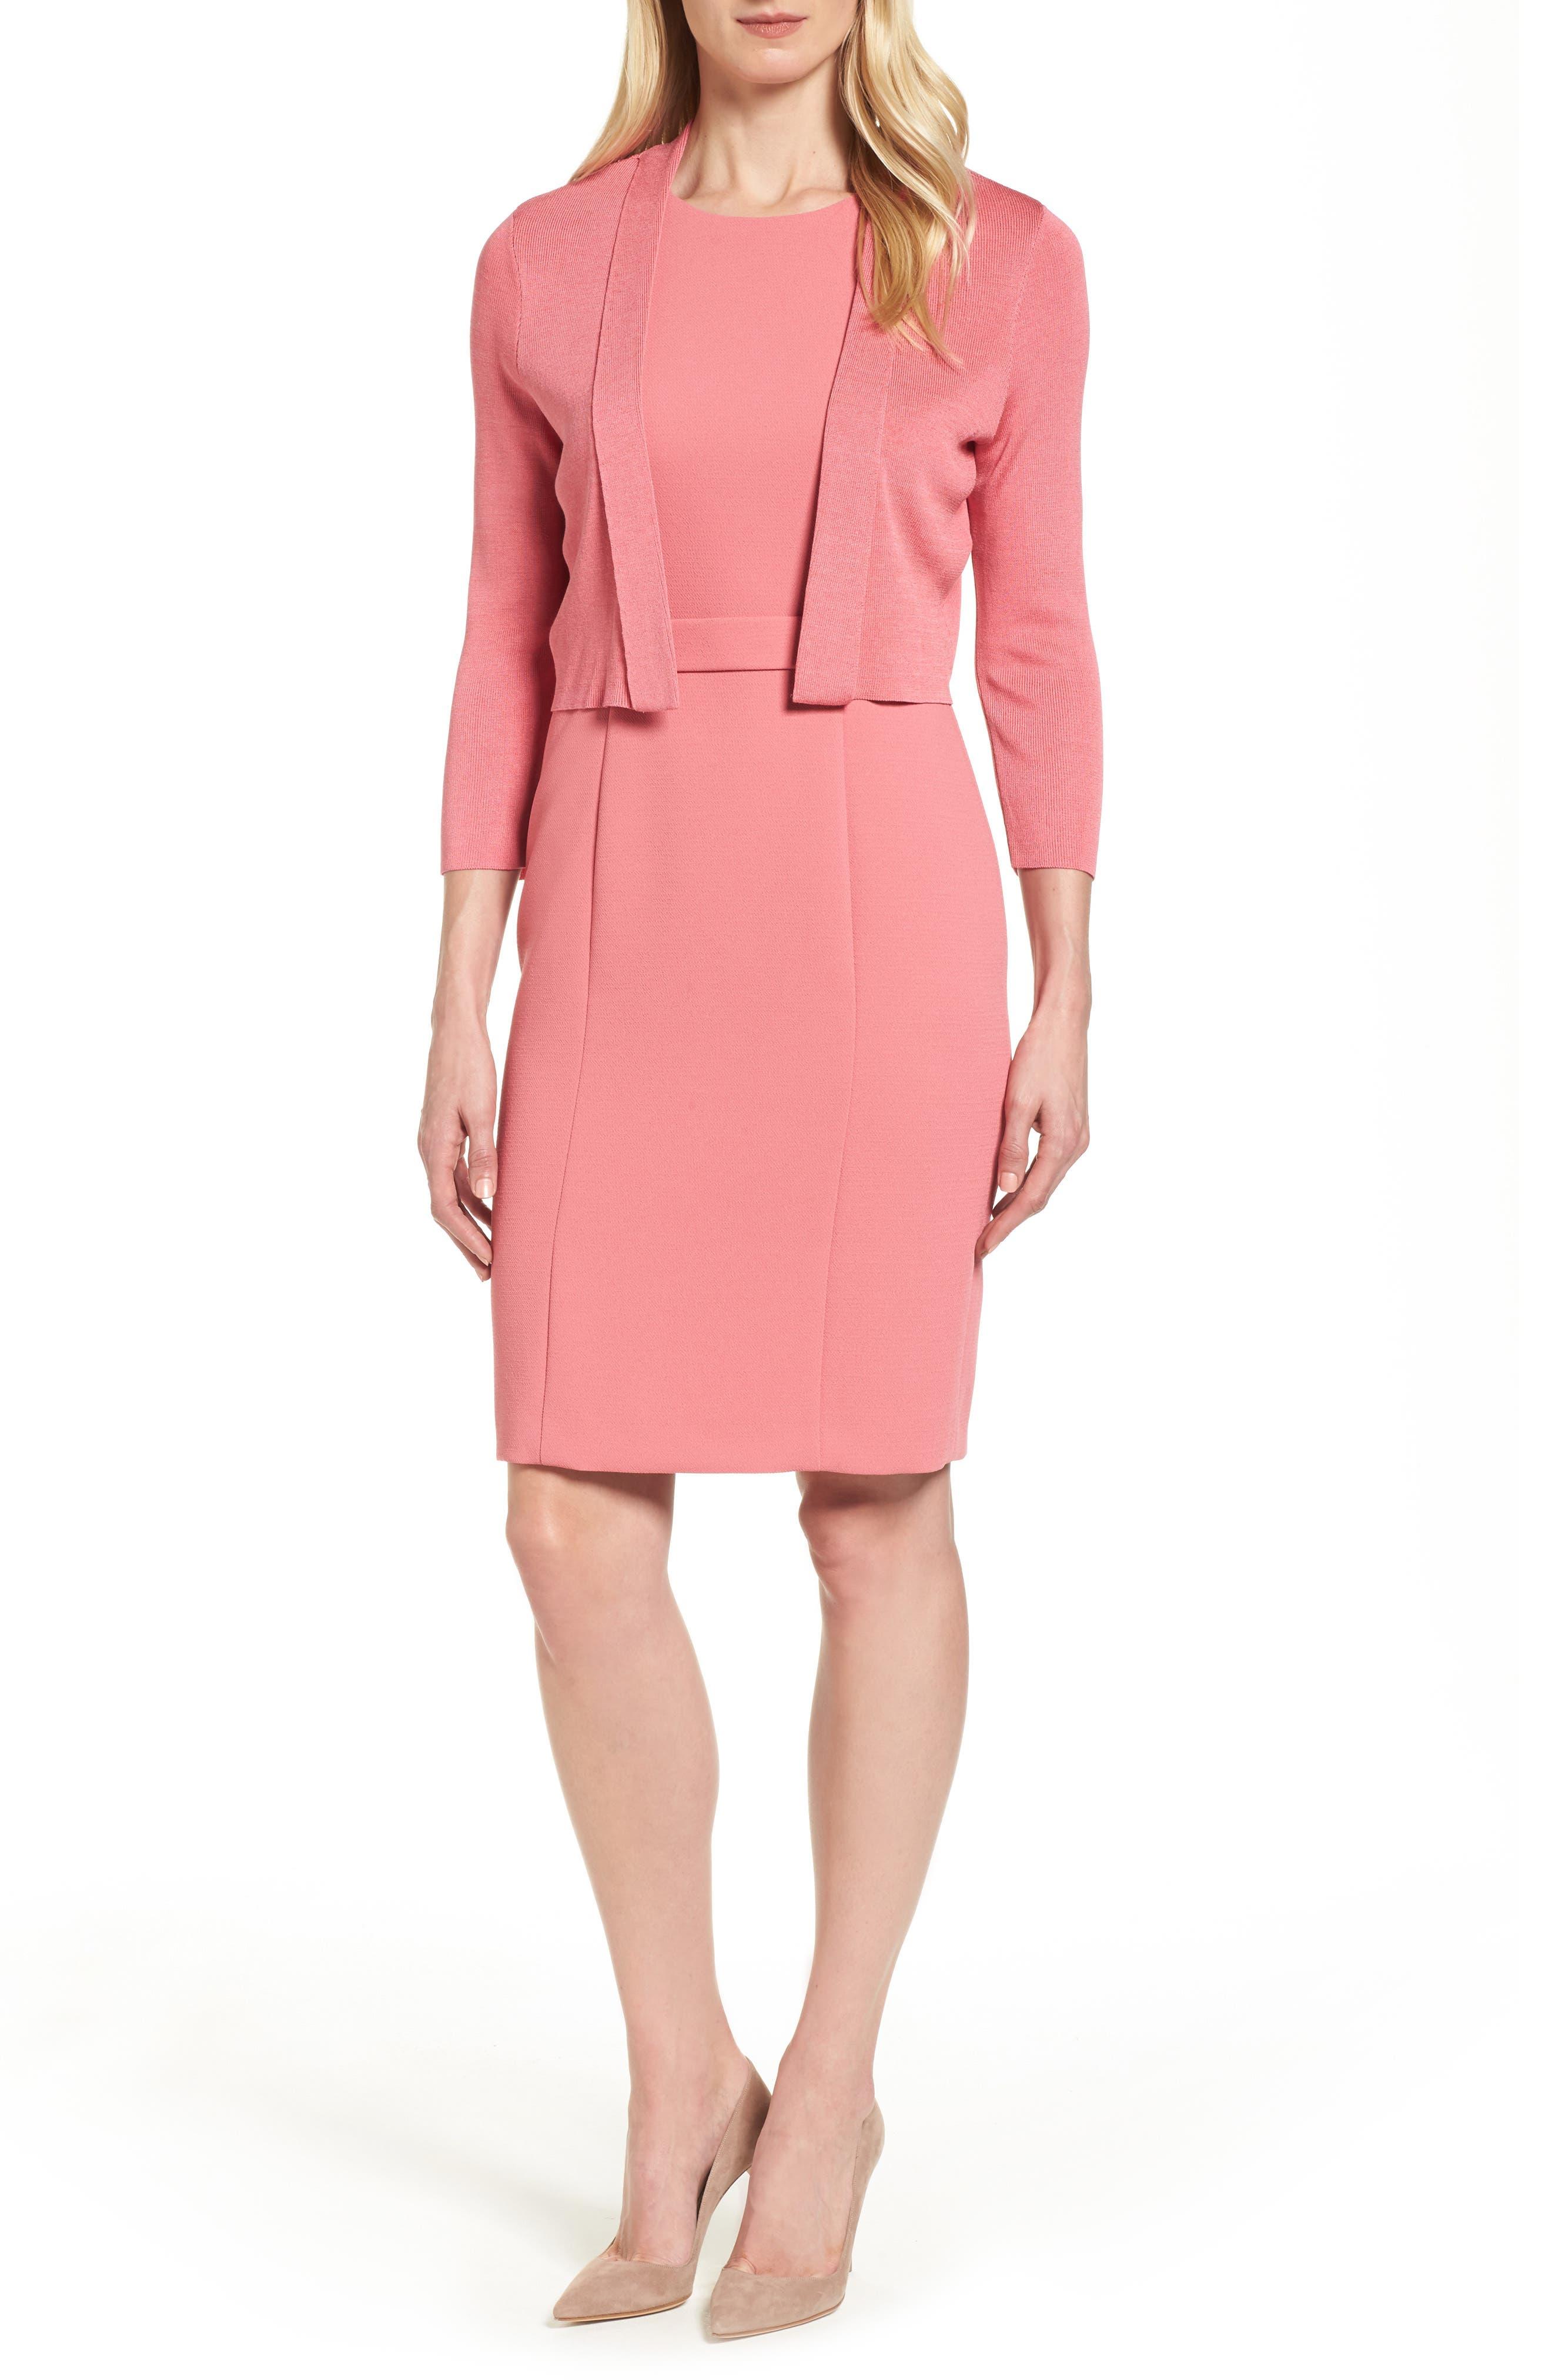 Dalanea Belted Sheath Dress,                             Alternate thumbnail 7, color,